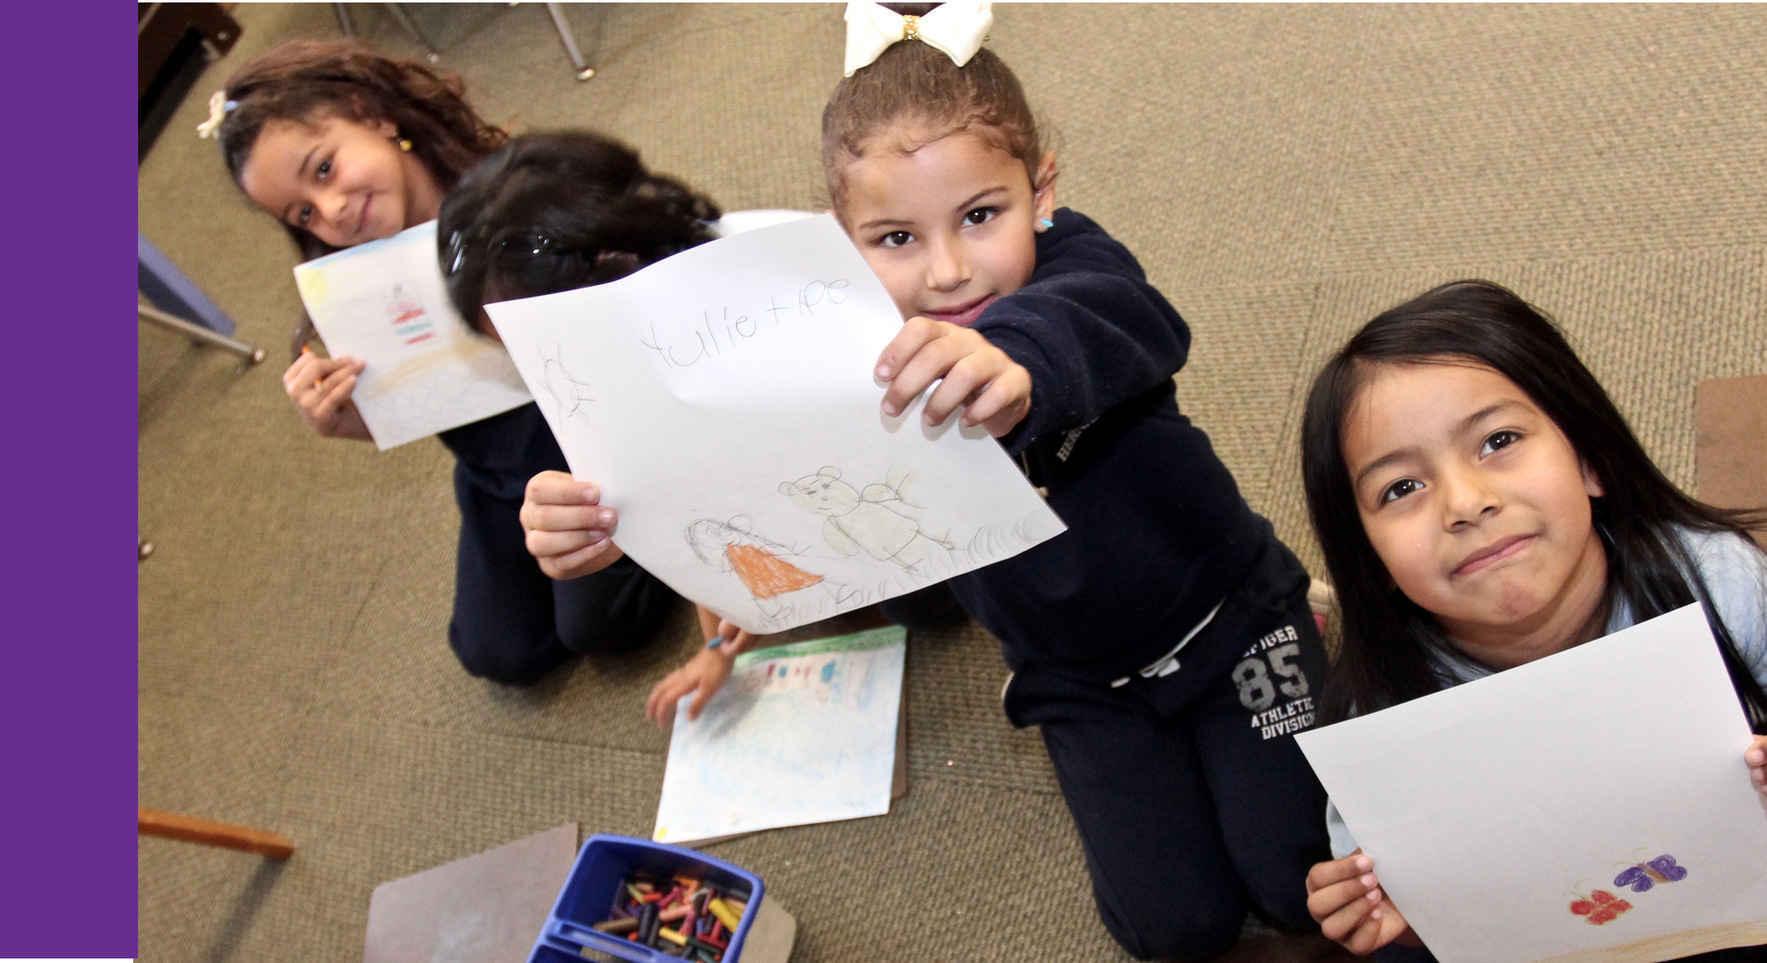 The Rafael Hernández Two-Way Bilingual School image